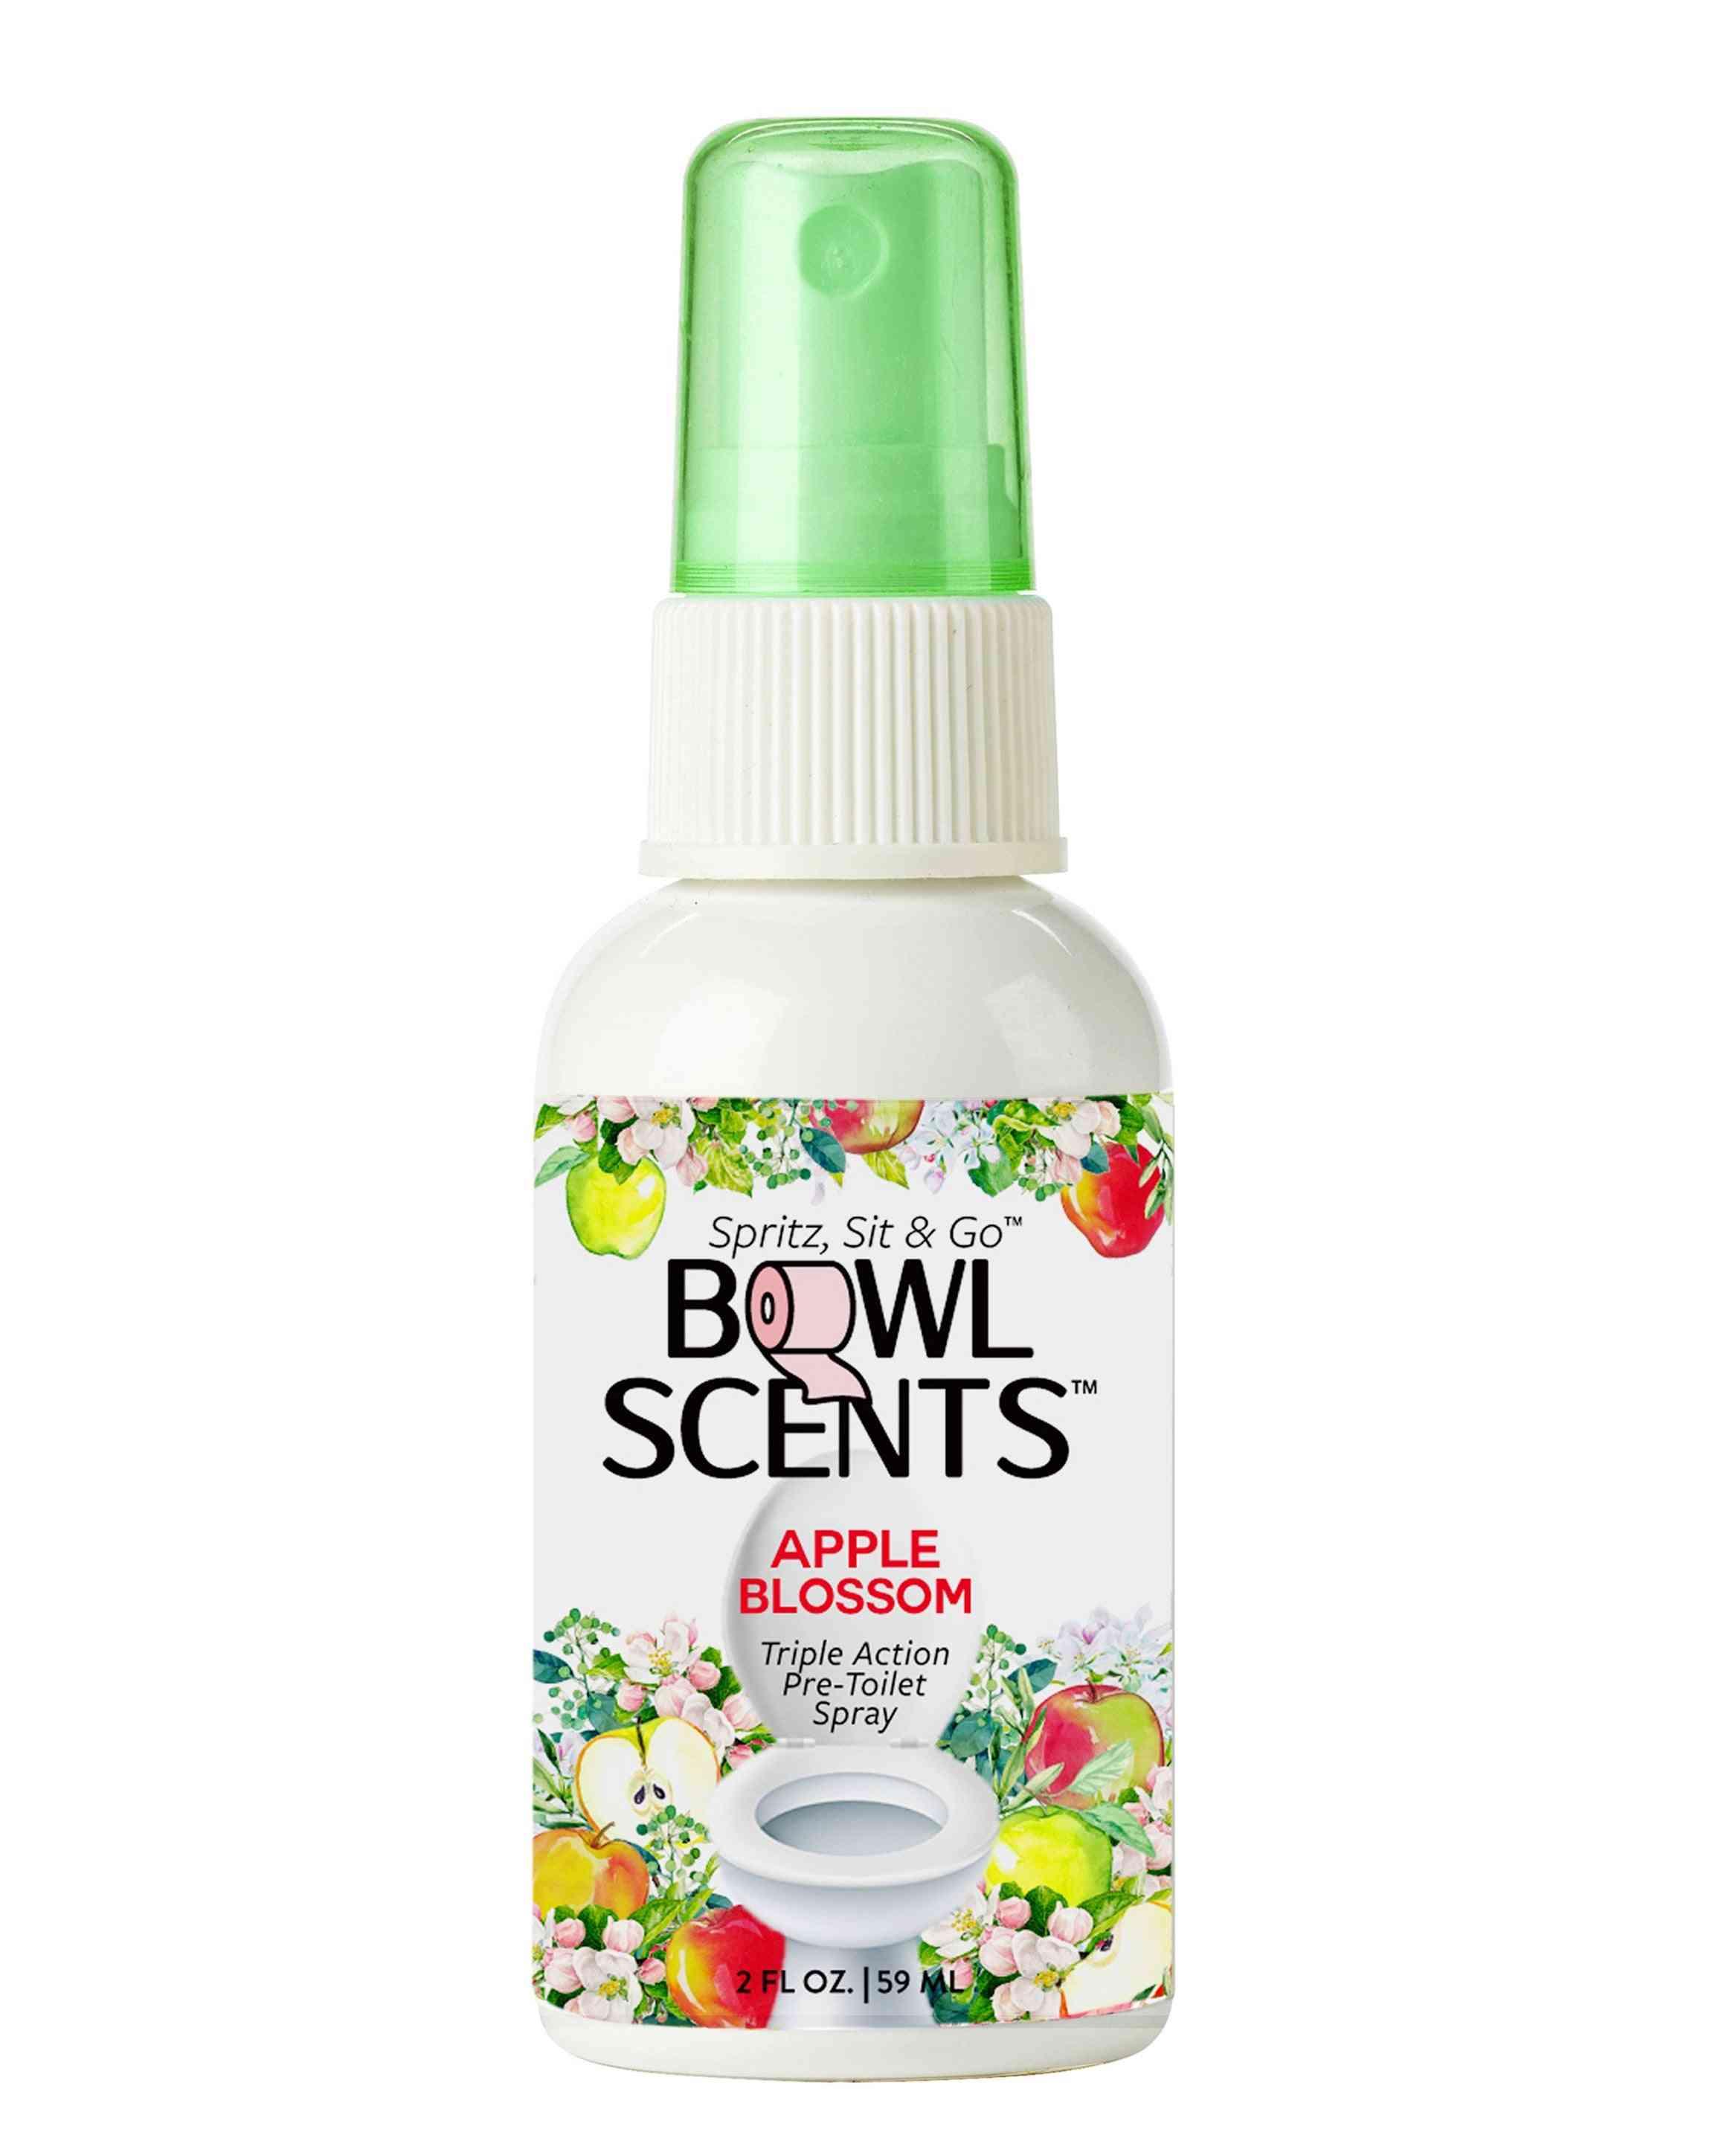 Bowl Scents Apple Blossom | 2oz Mini